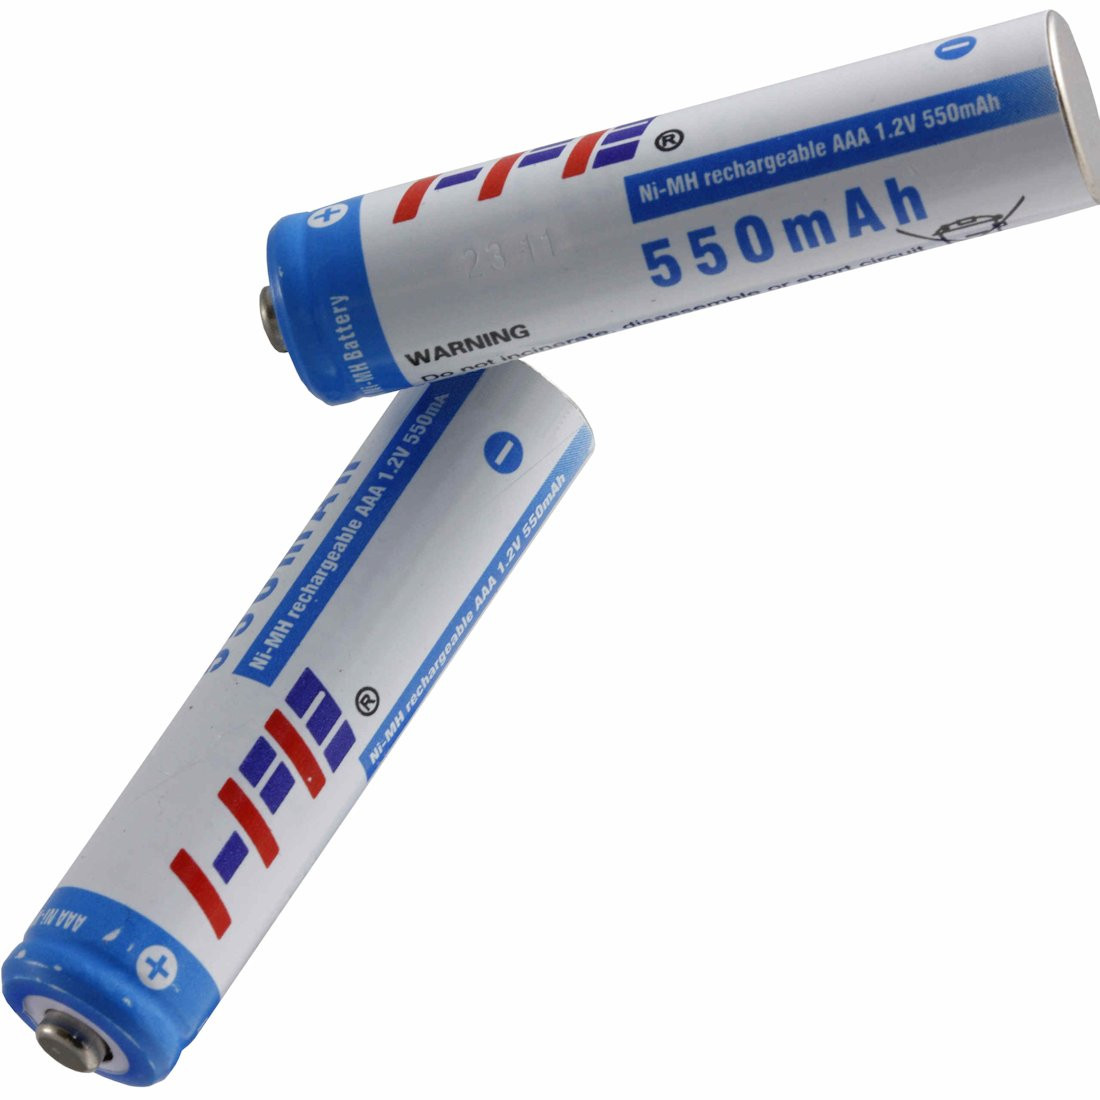 Original Batteries NIMH 550mAH (2 pc.) for Gigaset A2 / A34 / A38H / A400H...